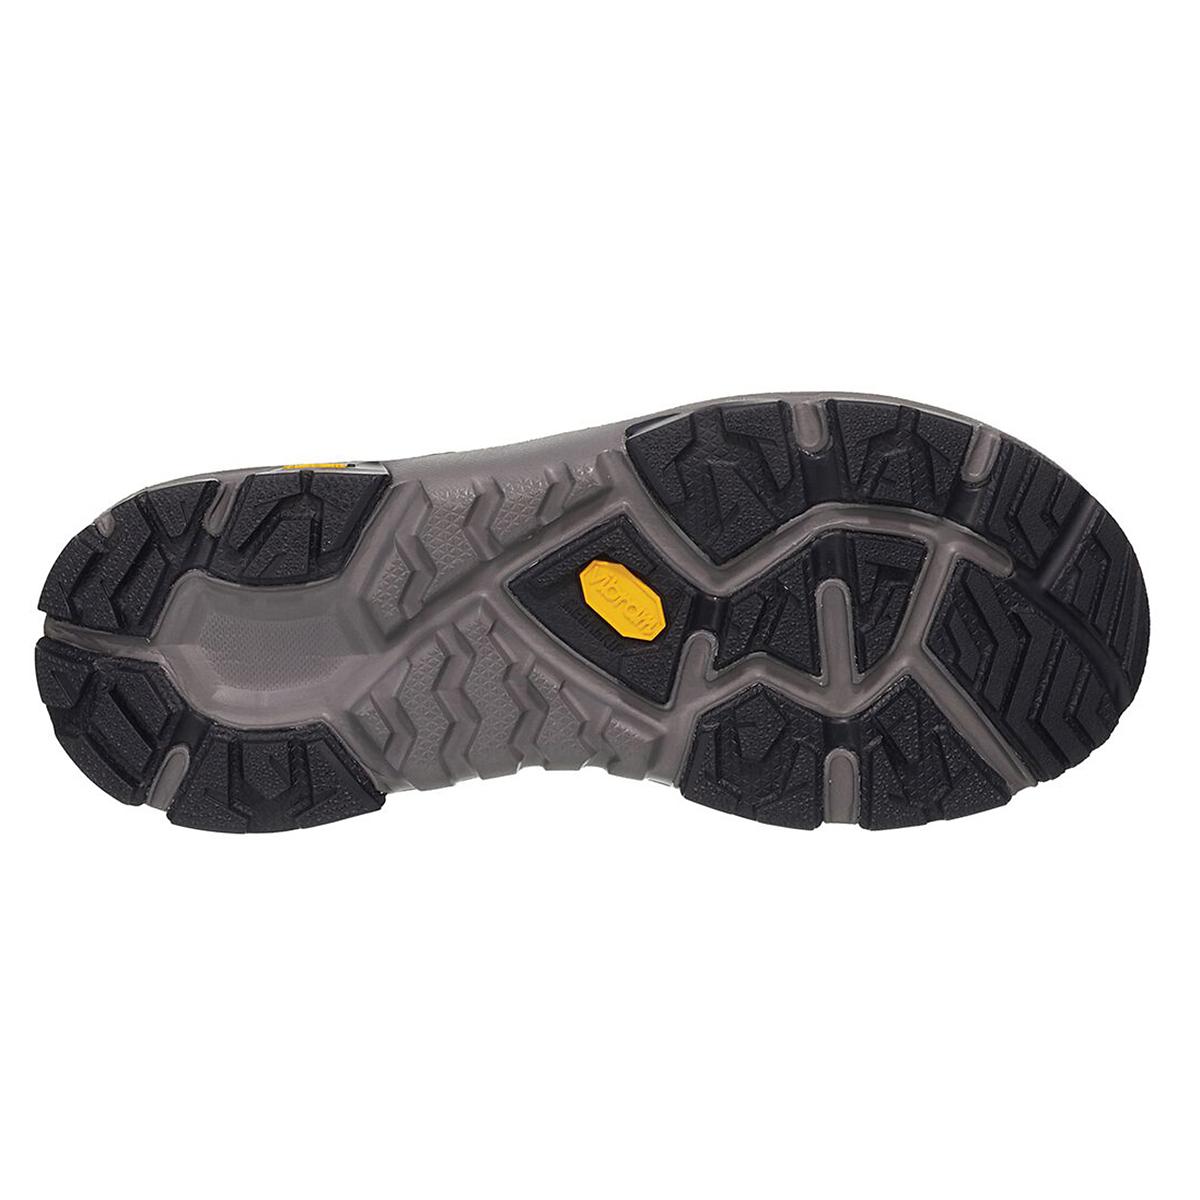 Men's Hoka One One Sky Toa Gore-Tex Trail Running Shoe - Color: Phantom - Size: 7 - Width: Regular, Phantom, large, image 4